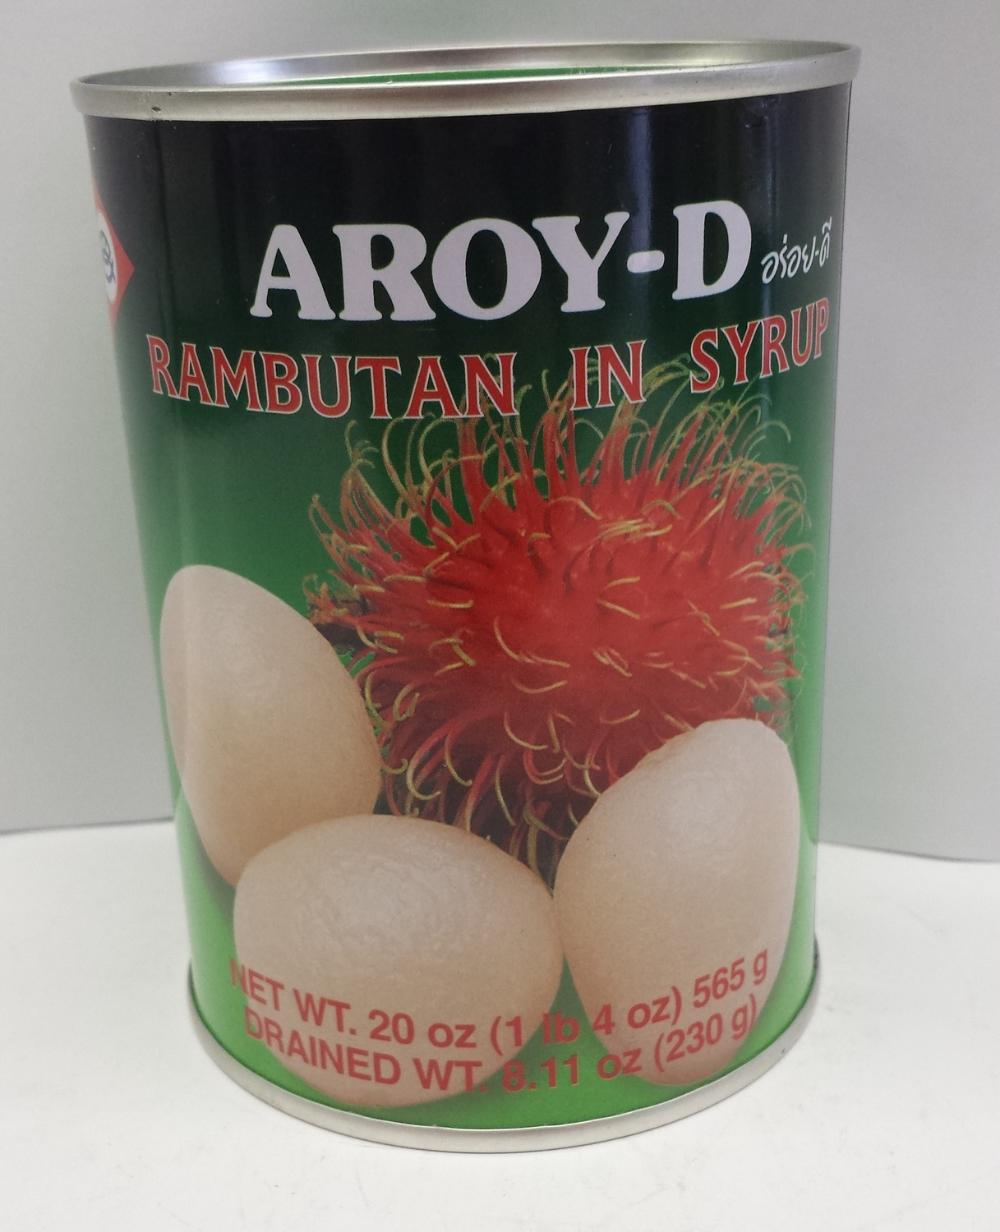 Rambutan in Syrup    Aroy-D   FC16300 24x20 oz